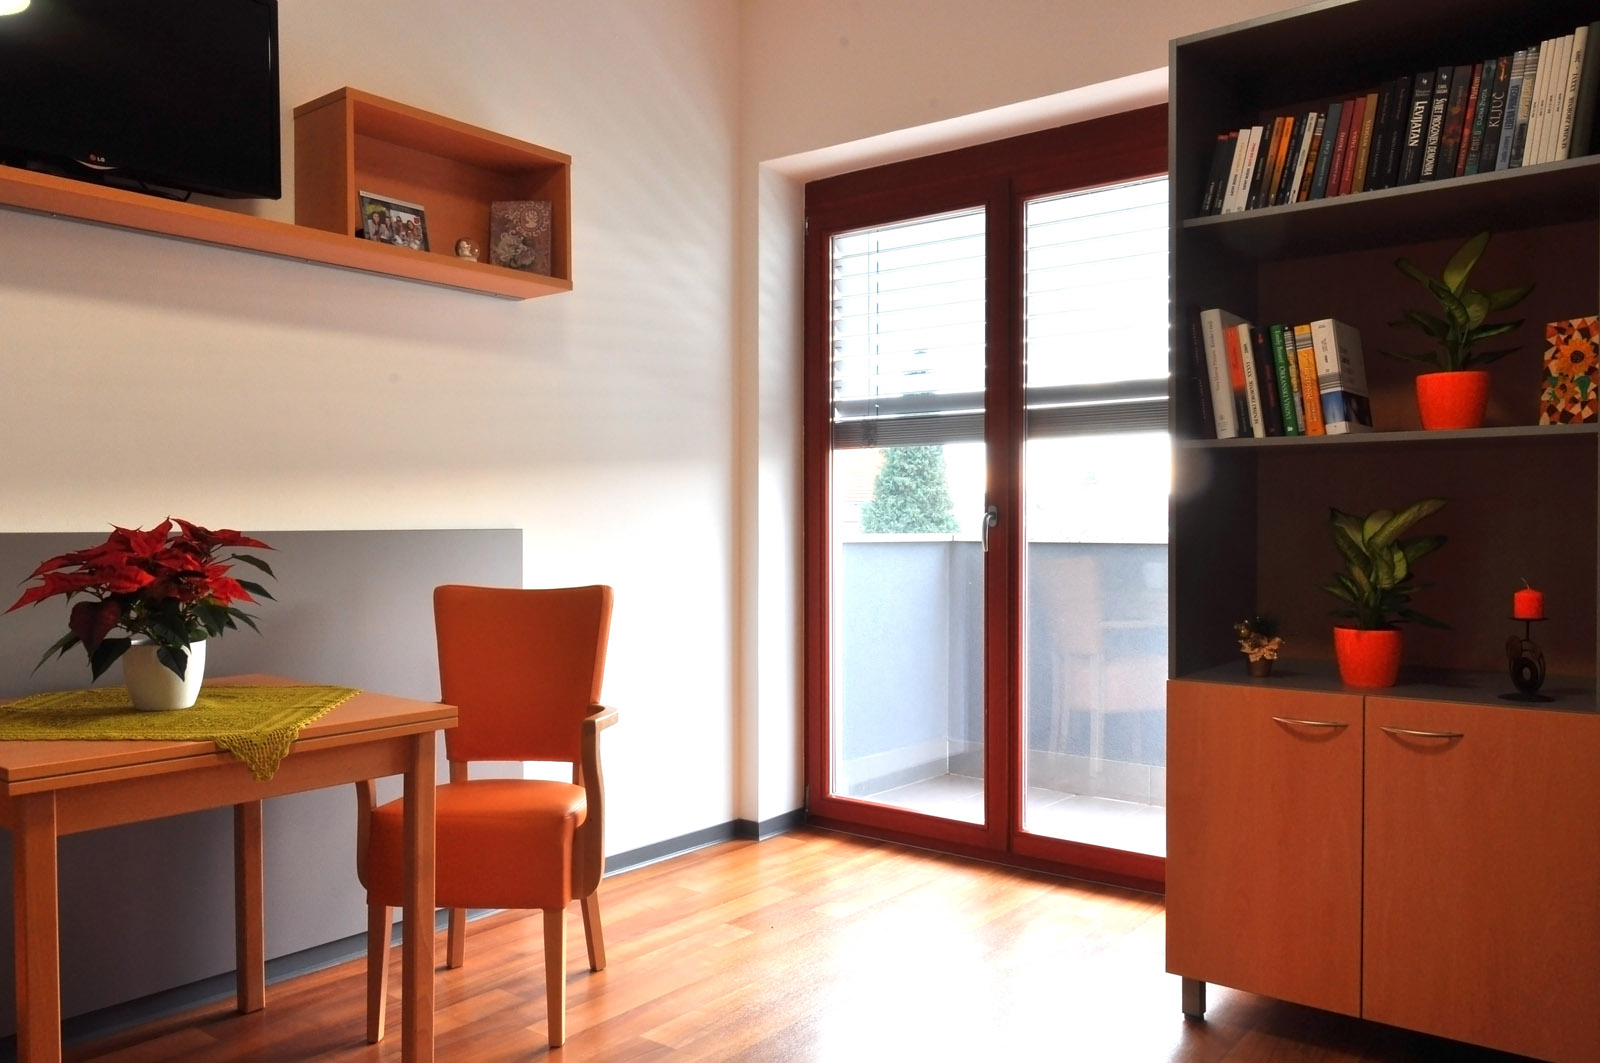 Jednokrevetna soba s balkonom